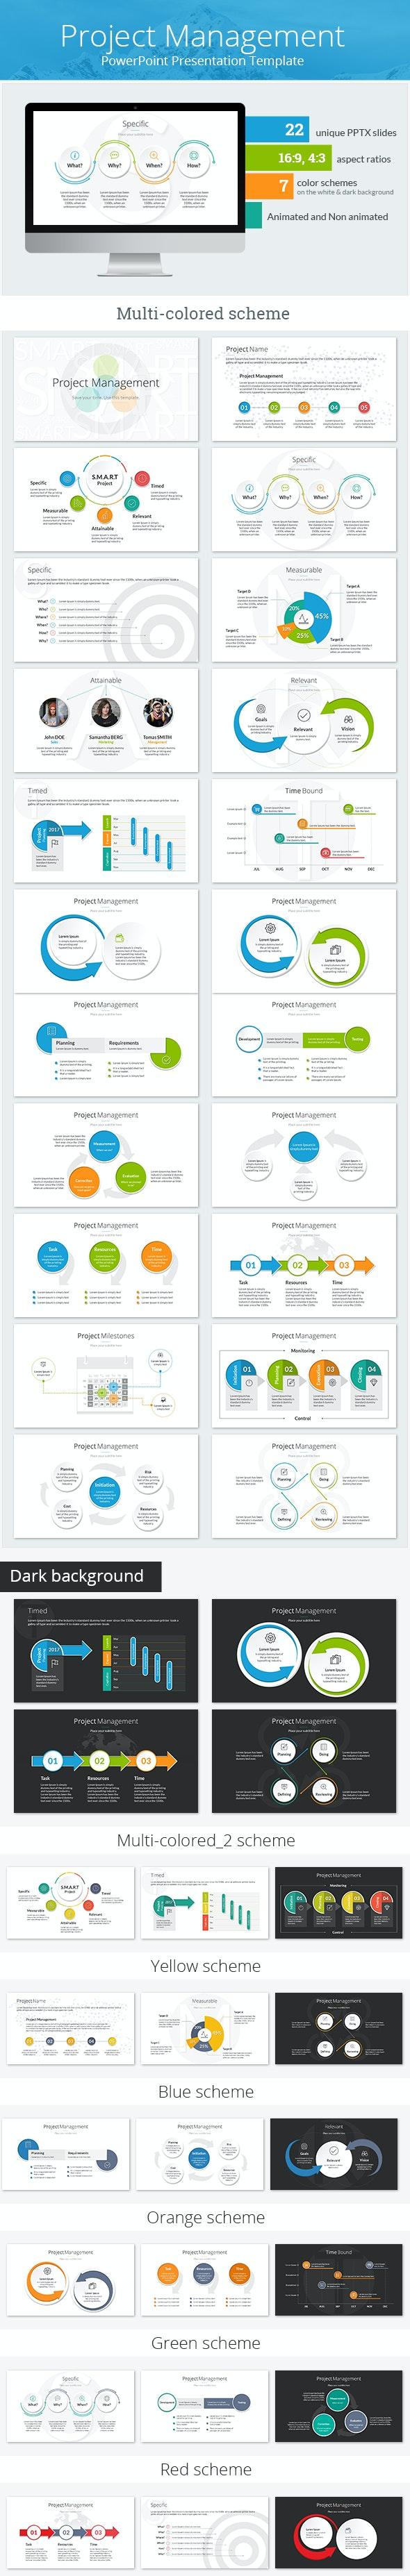 Project Management PowerPoint Presentation Template - PowerPoint Templates Presentation Templates